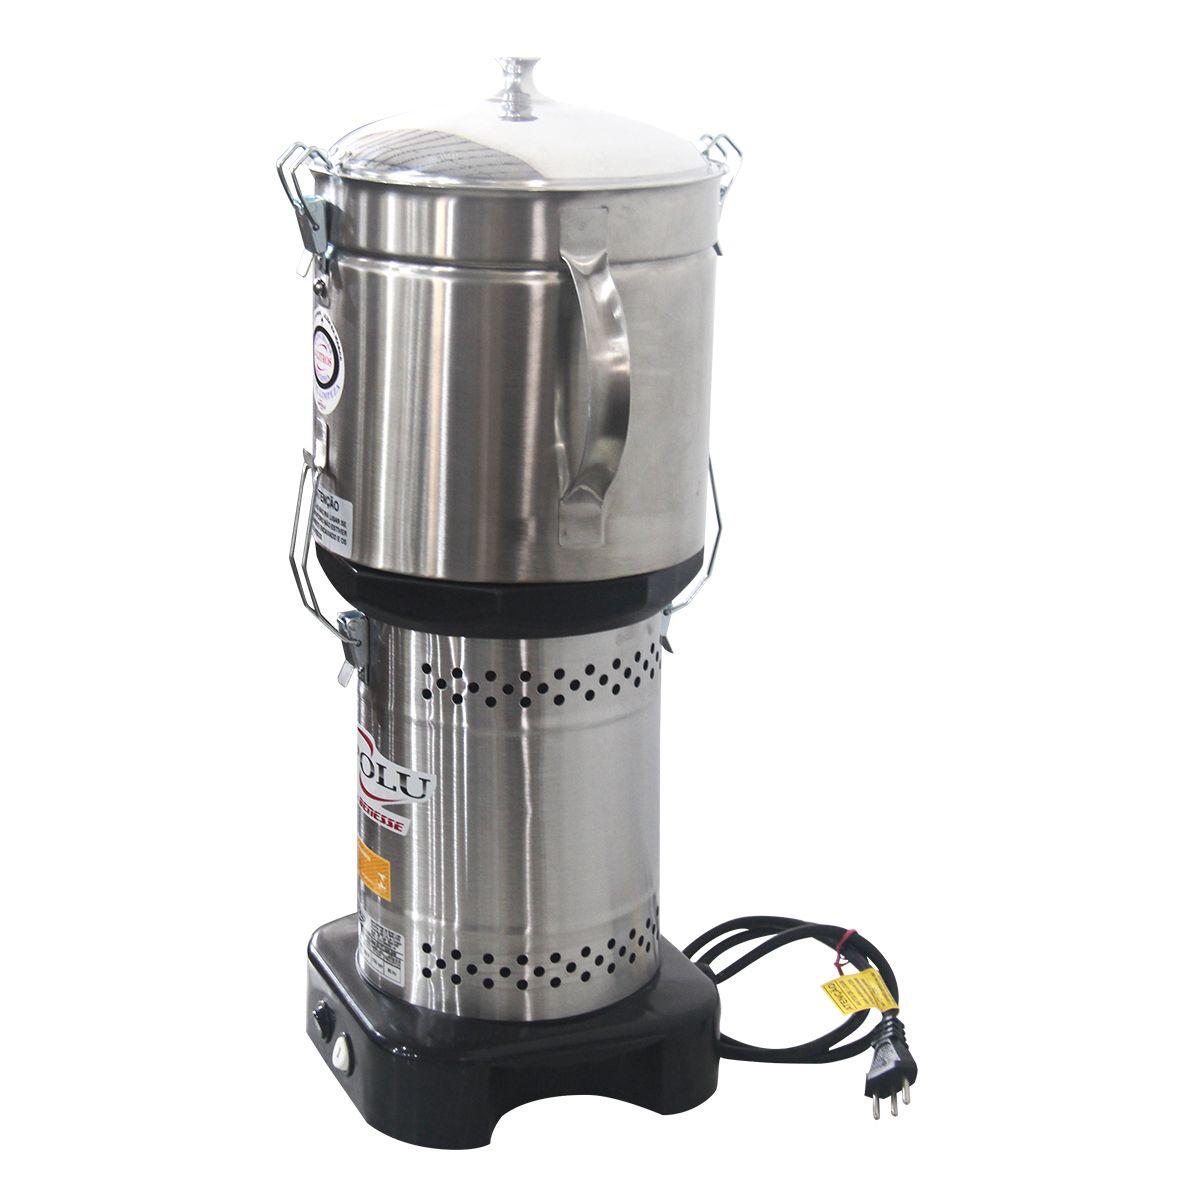 Processador De Alimentos Industrial Cutter 4 Litros 600W Spl200 - Spolu